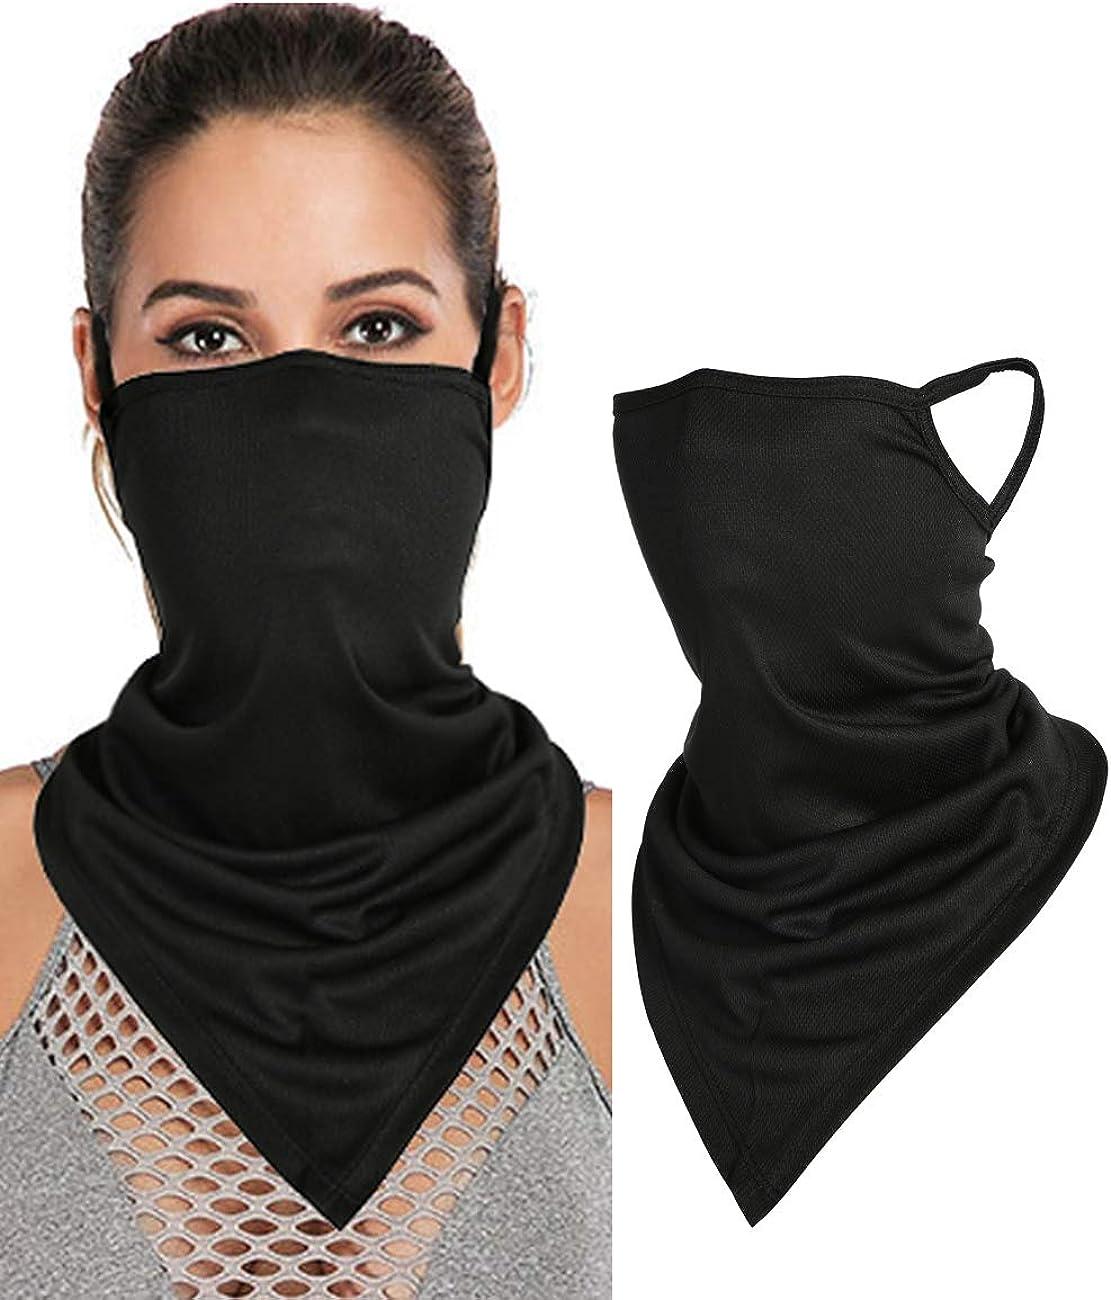 Unisex Face Bandana Masks Ear Loops Headwear Balaclava Triangle Scarf Neck Gaiters for Dust Protection